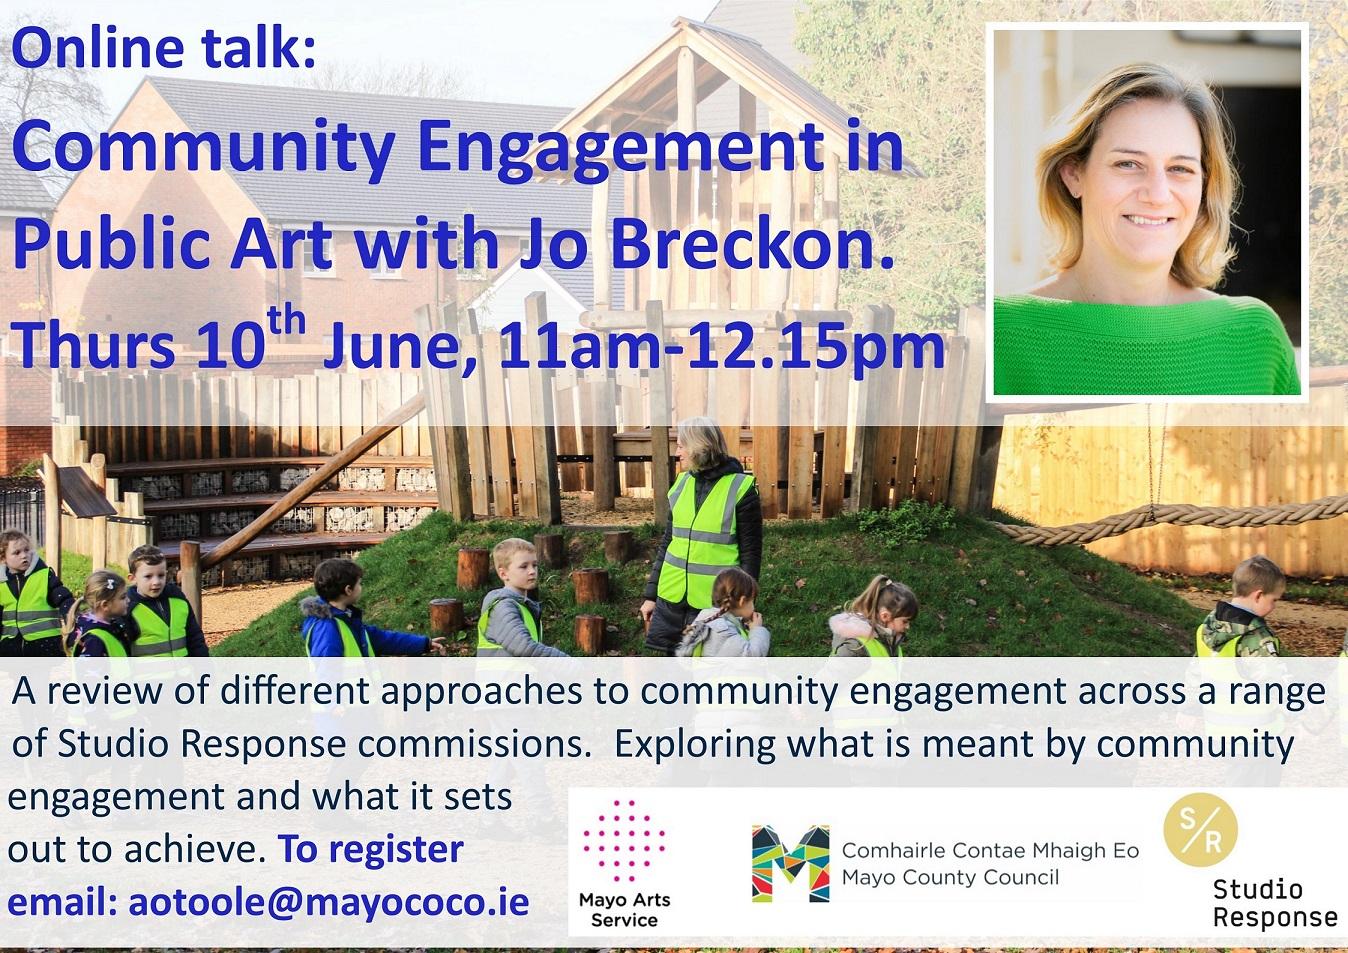 Online Artist Talk | Case Studies in Community Engagement in Public Art with Jo Breckon, Co- Director, Studio Response